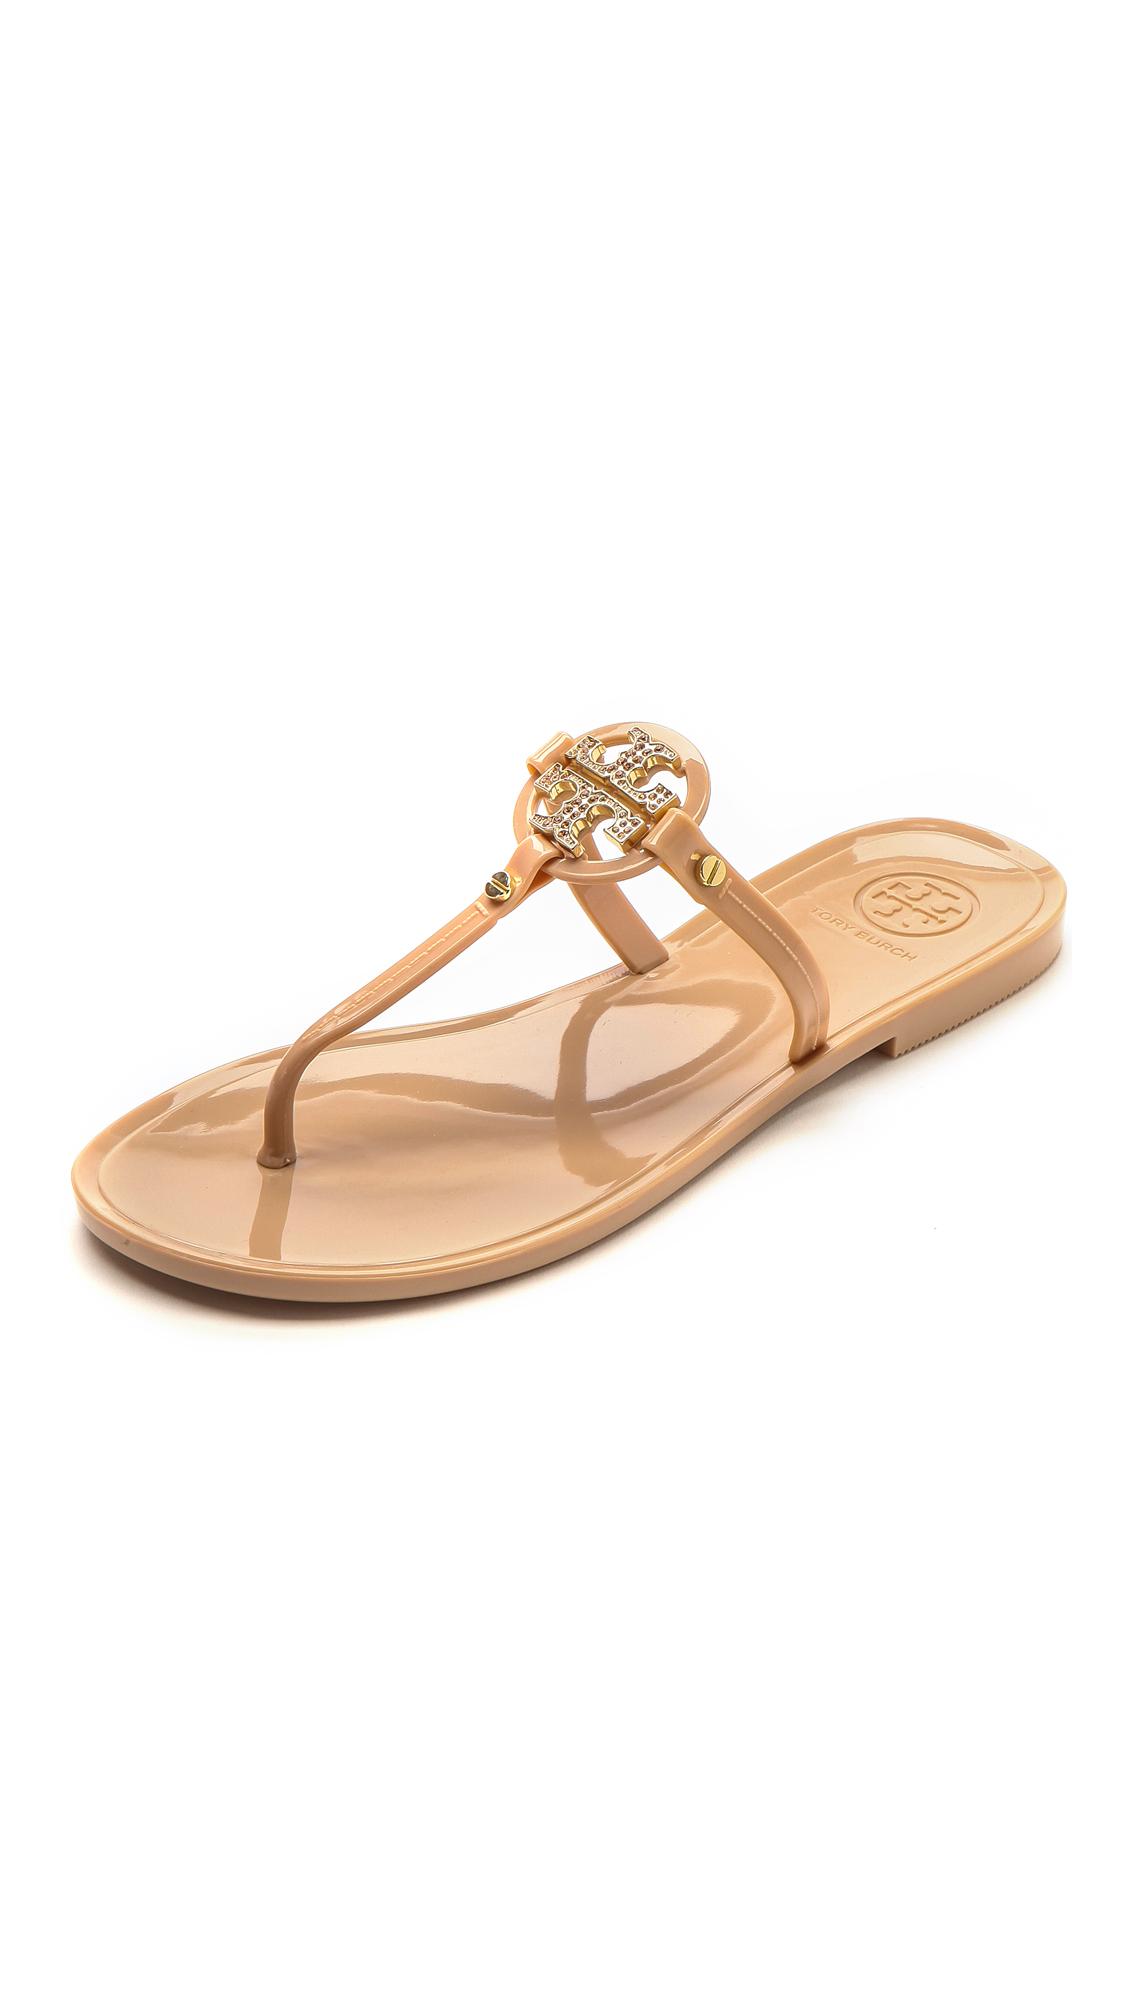 8064eeeb6 Lyst - Tory Burch Mini Miller Flat Thong Sandals - Blush in Pink